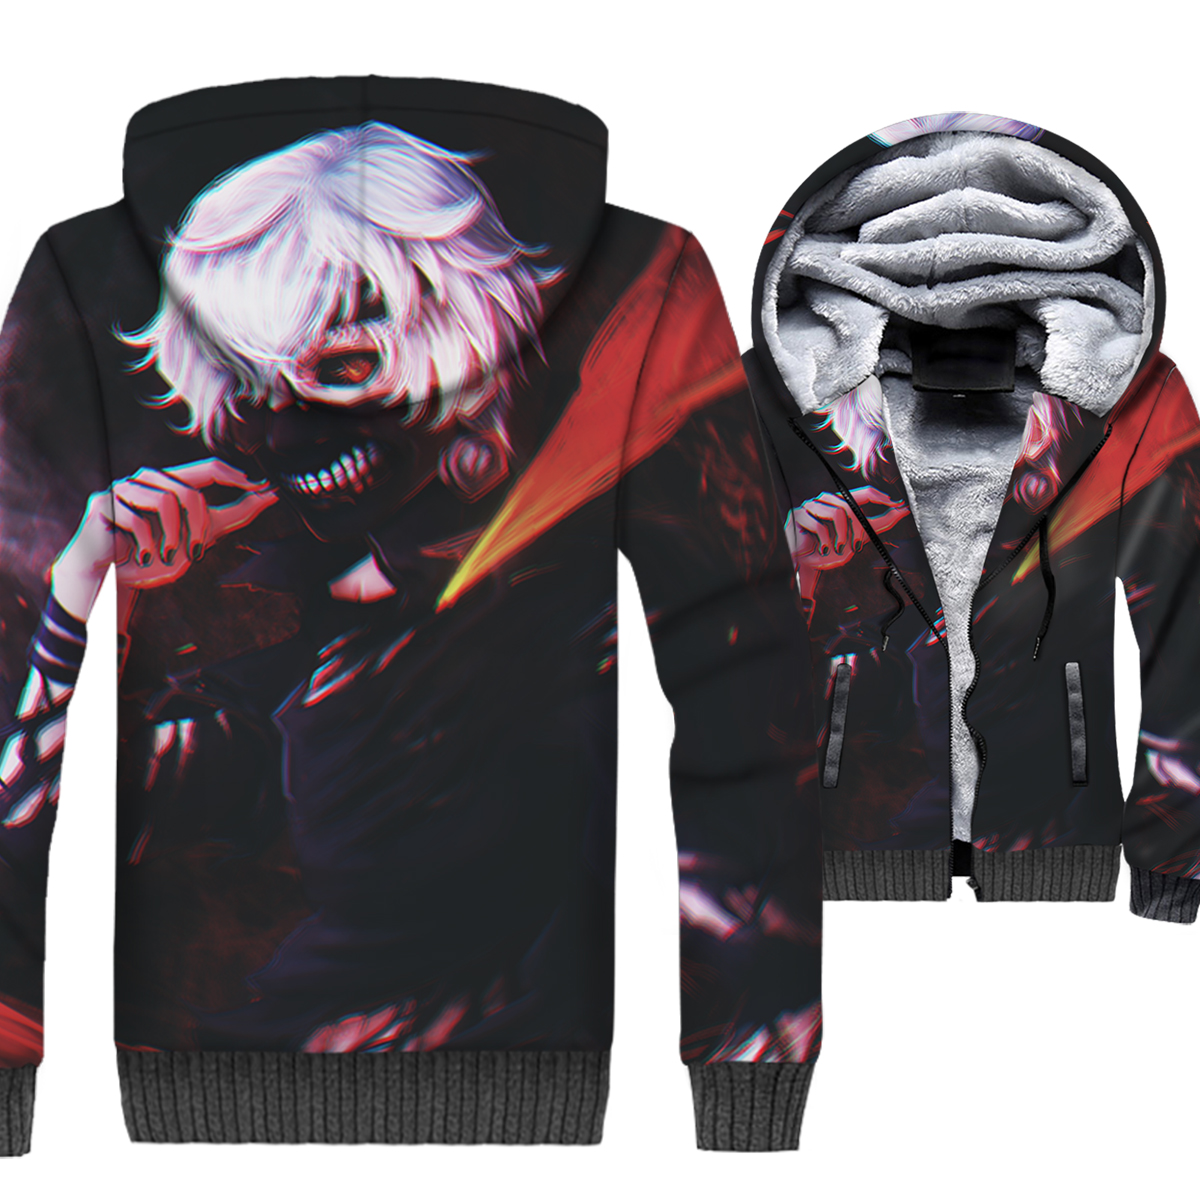 Anime Tokyo Ghoul Jacket Men Ken Kaneki Hoodie New Design Sweatshirt Winter Thick Fleece Warm 3D Print Coat Punk Streetwear Mens